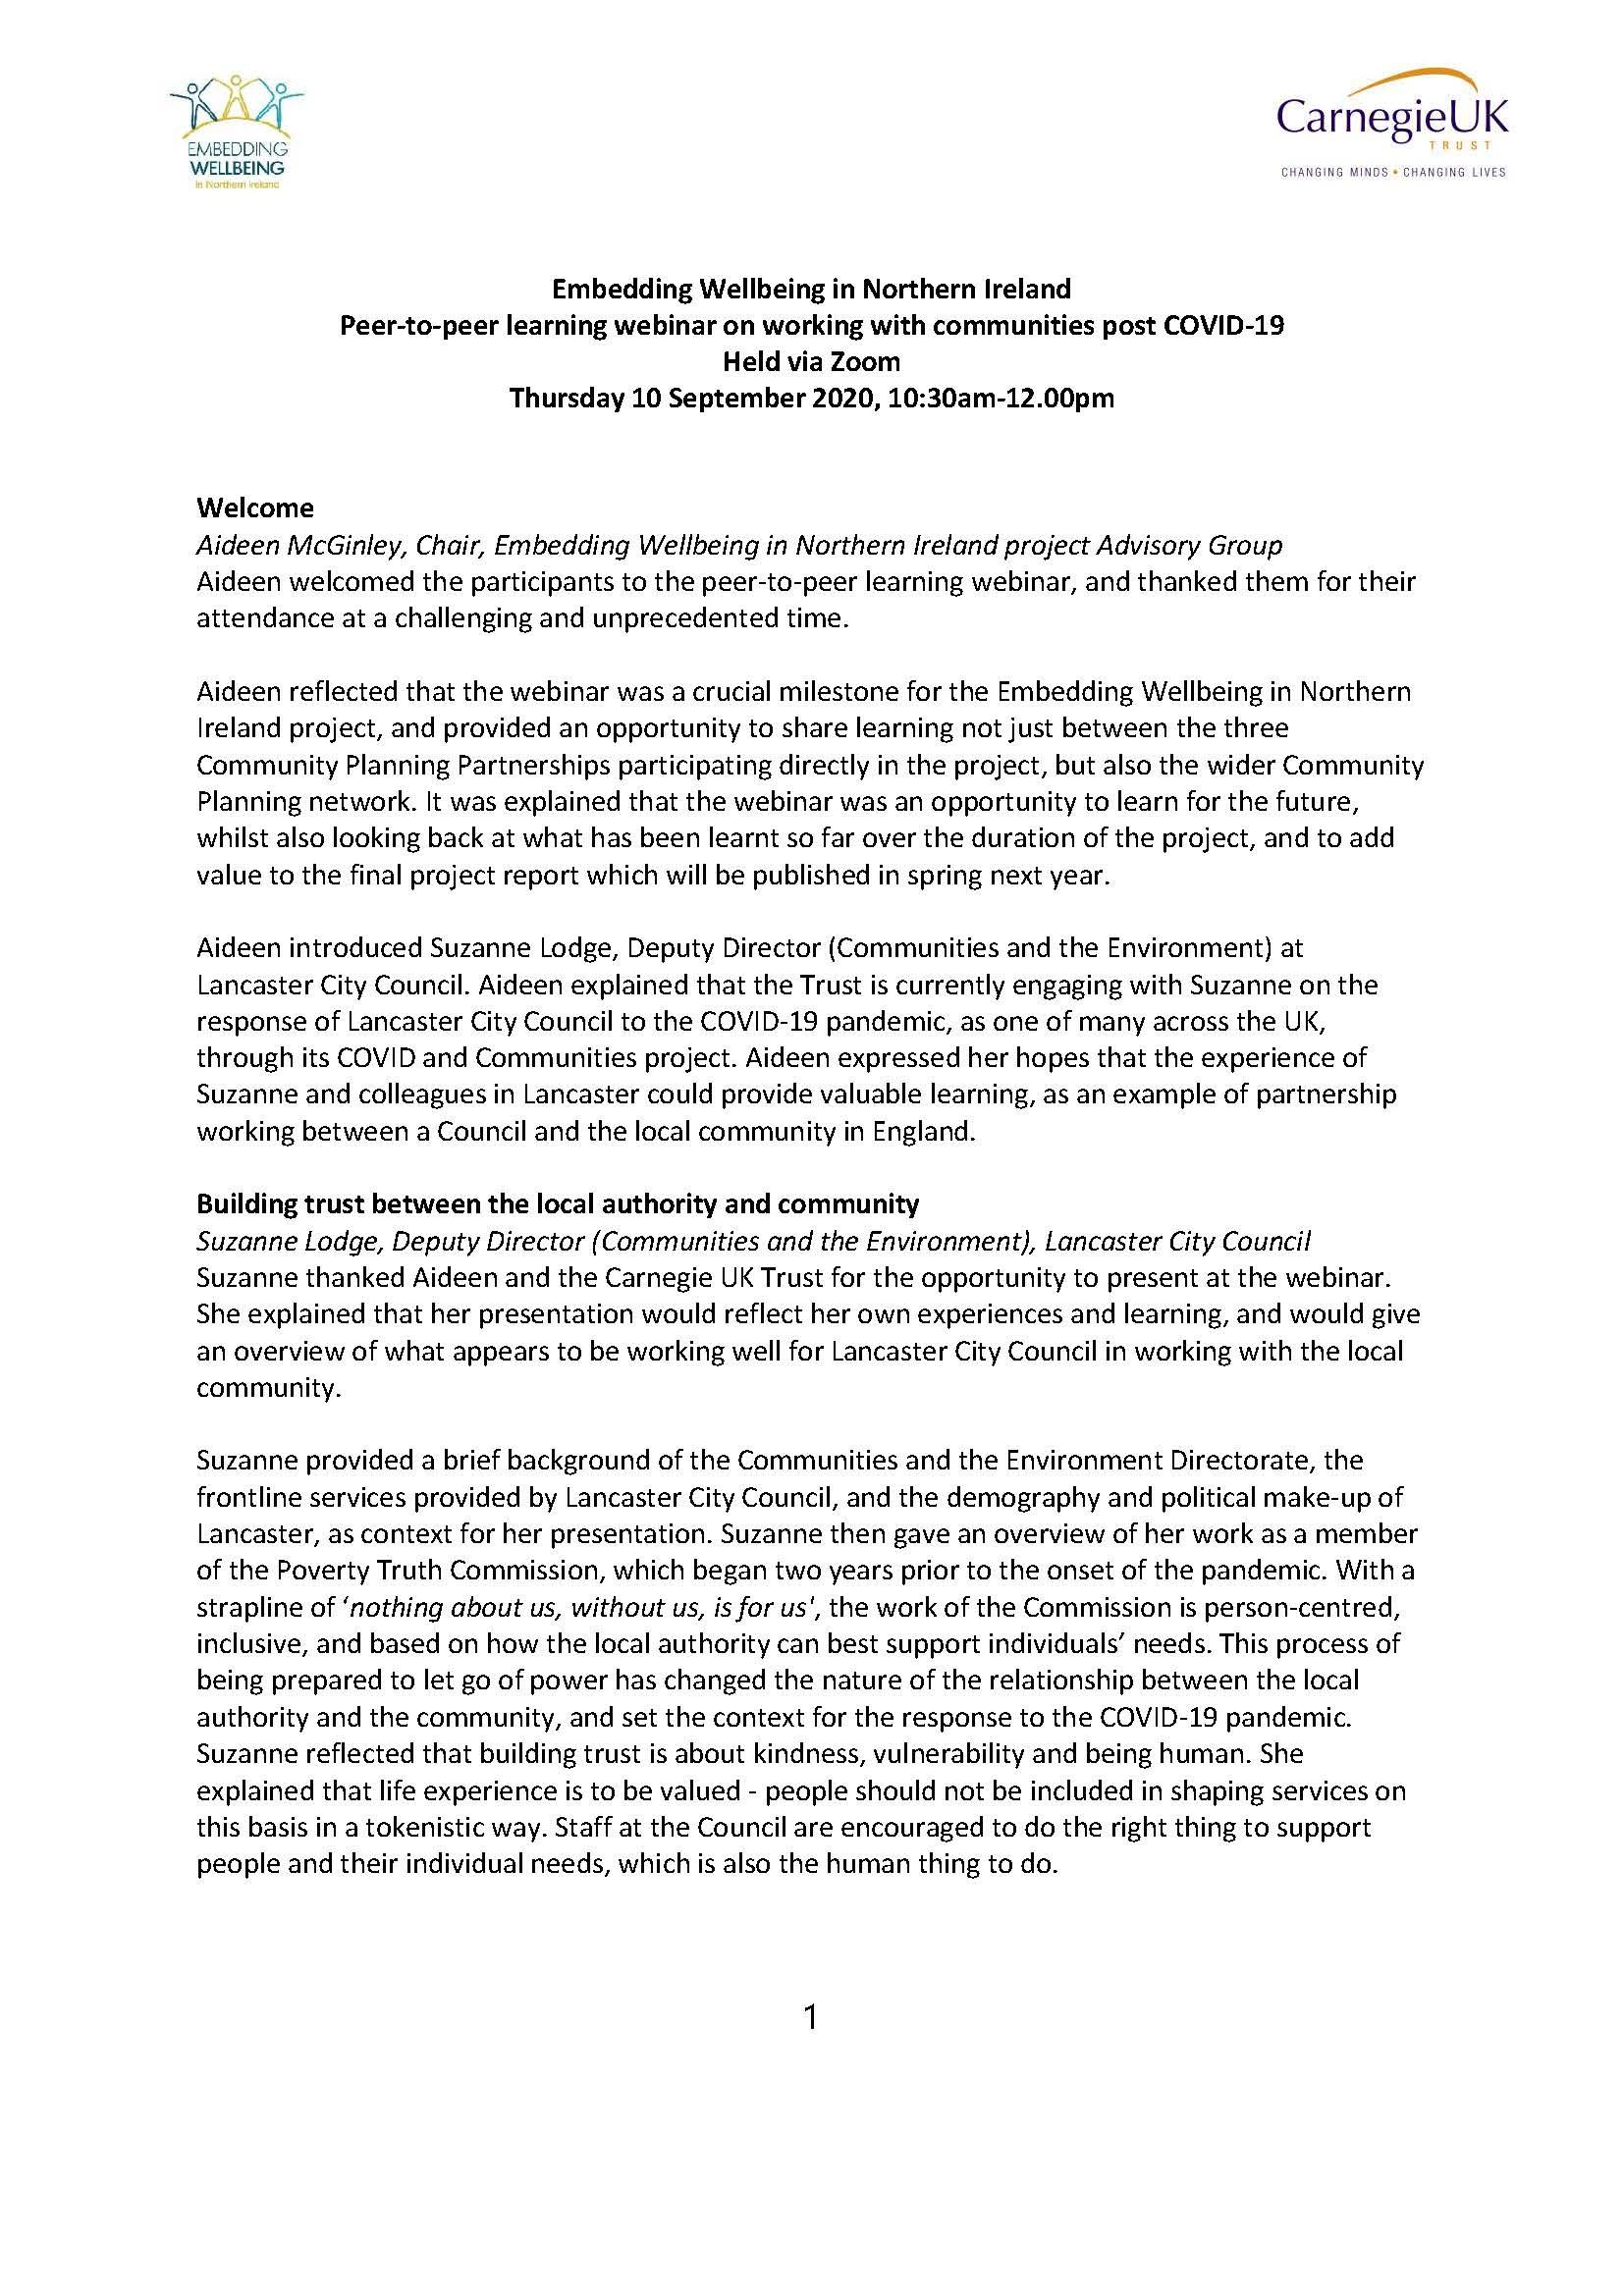 Embedding Wellbeing in Northern Ireland Peer-to-peer learning webinar on working with communities post COVID-19